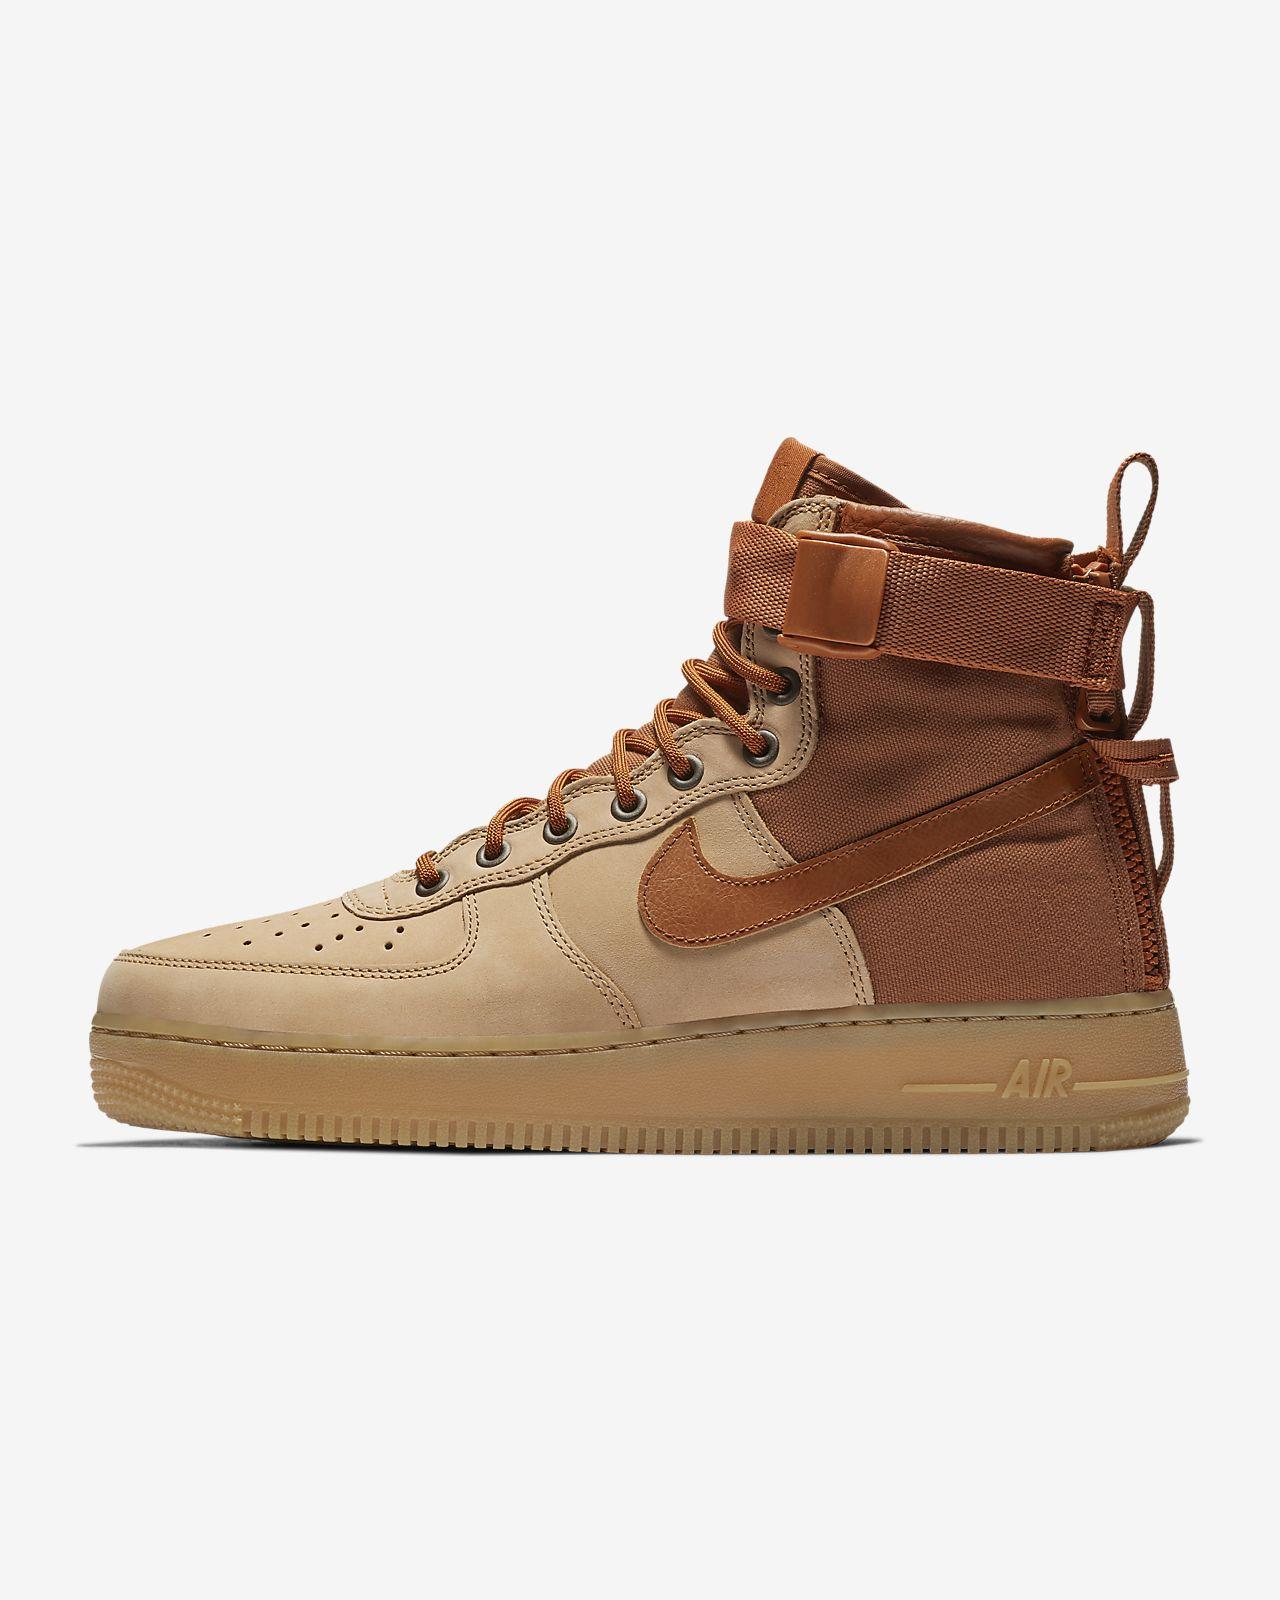 Sko Nike SF Air Force 1 Mid Premium för män